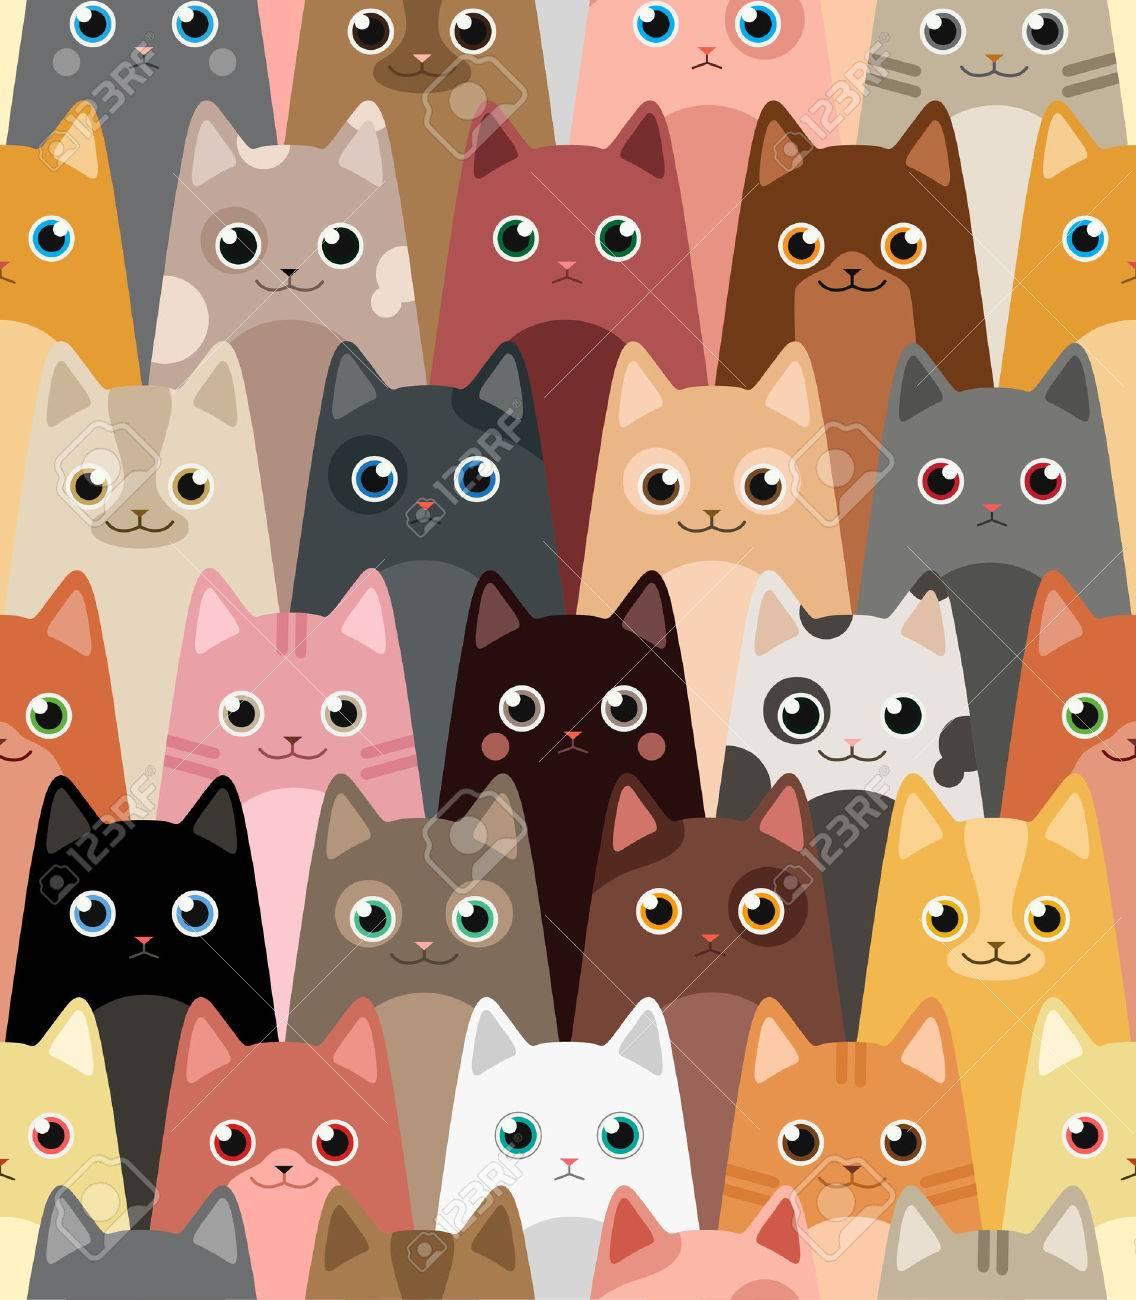 Cats Cartoon Vector Seamless Wallpaper Royalty Free Cliparts